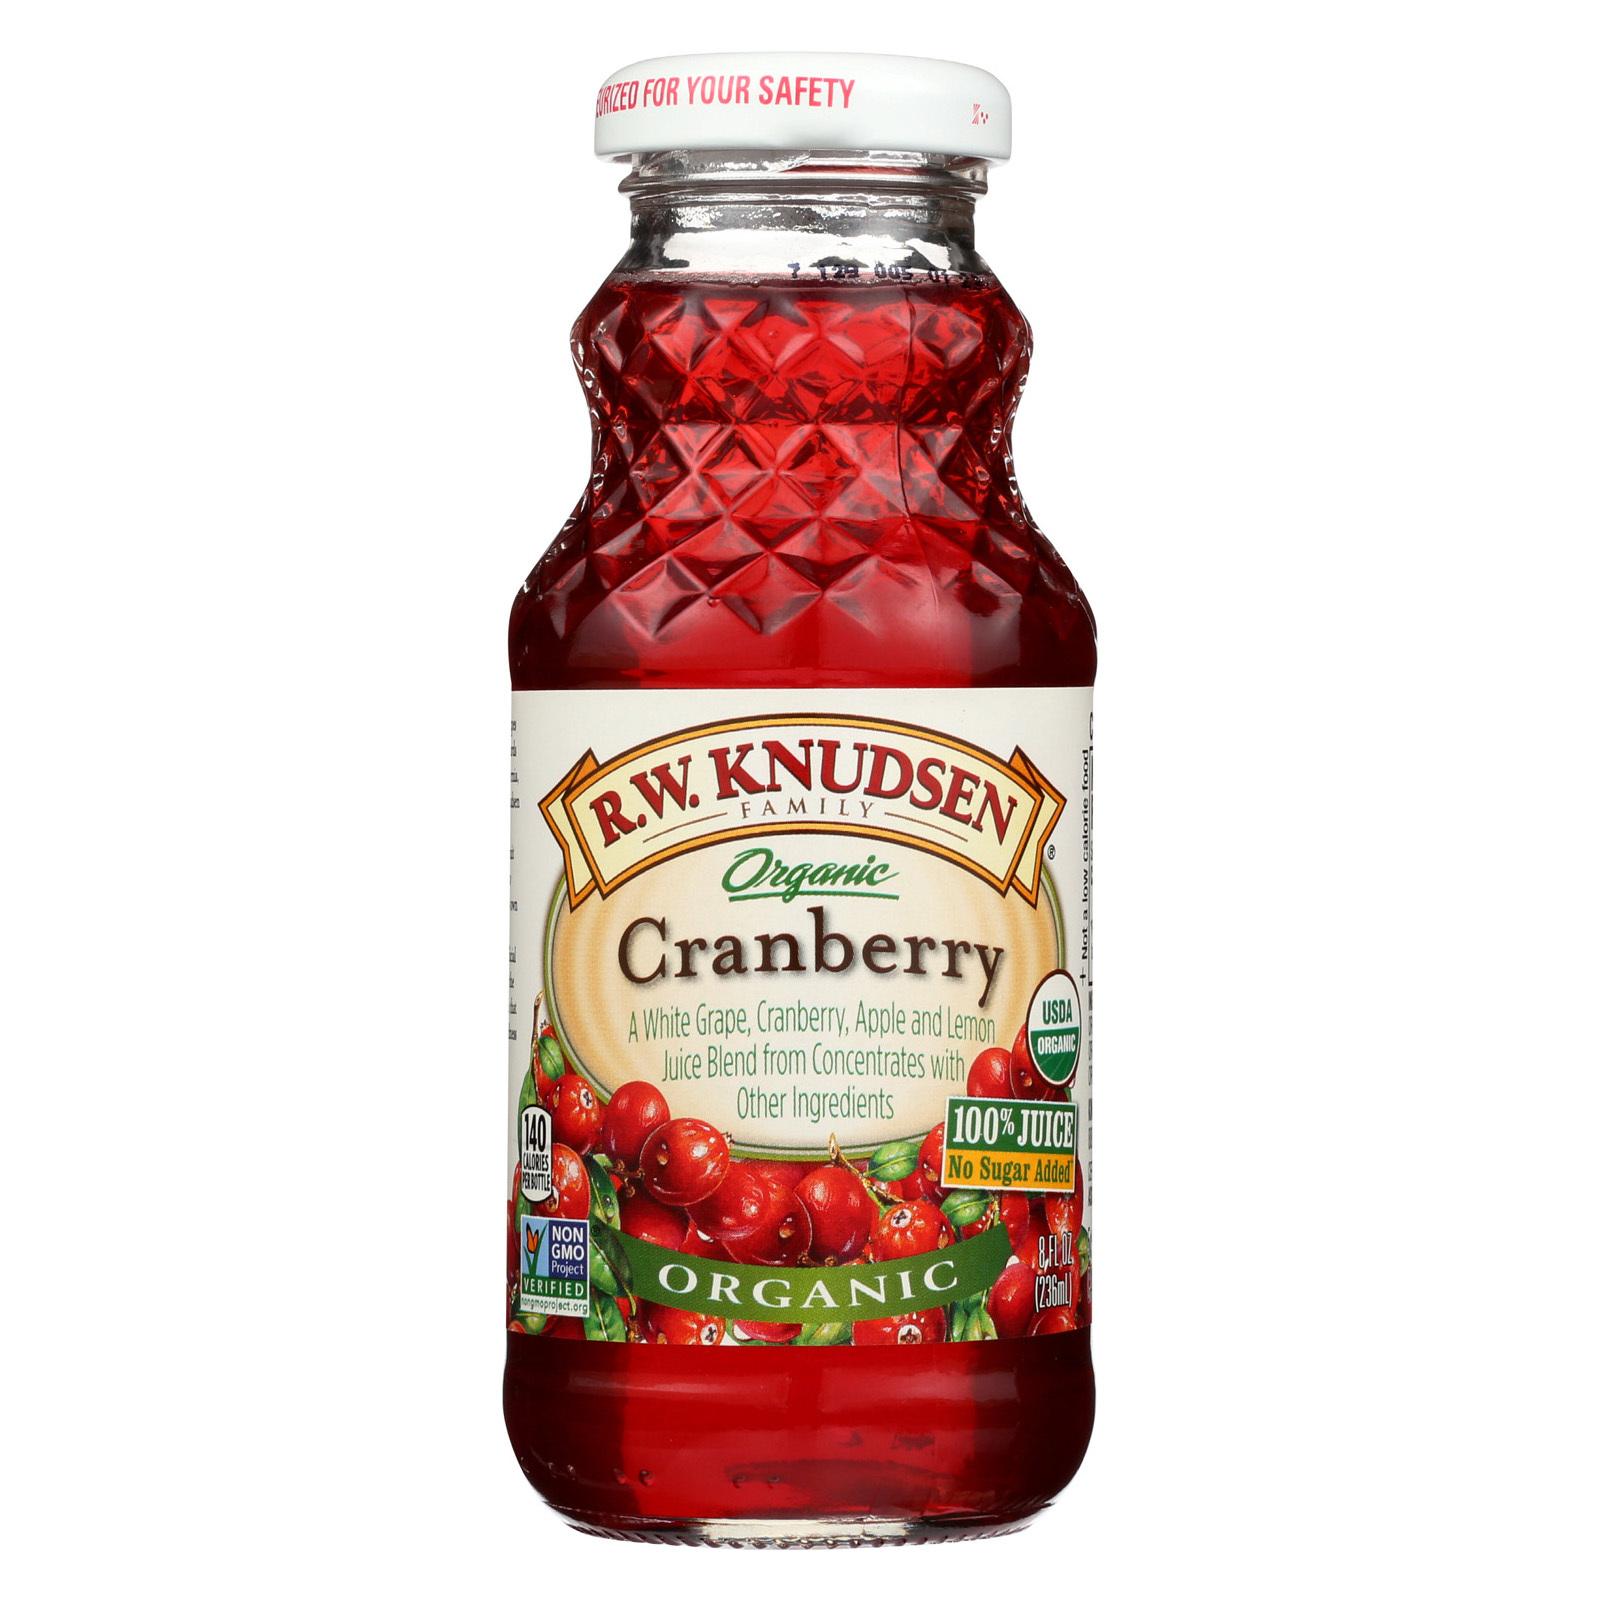 R.W. Knudsen Organic Cranberry Juice - Case of 24 - 8 fl oz